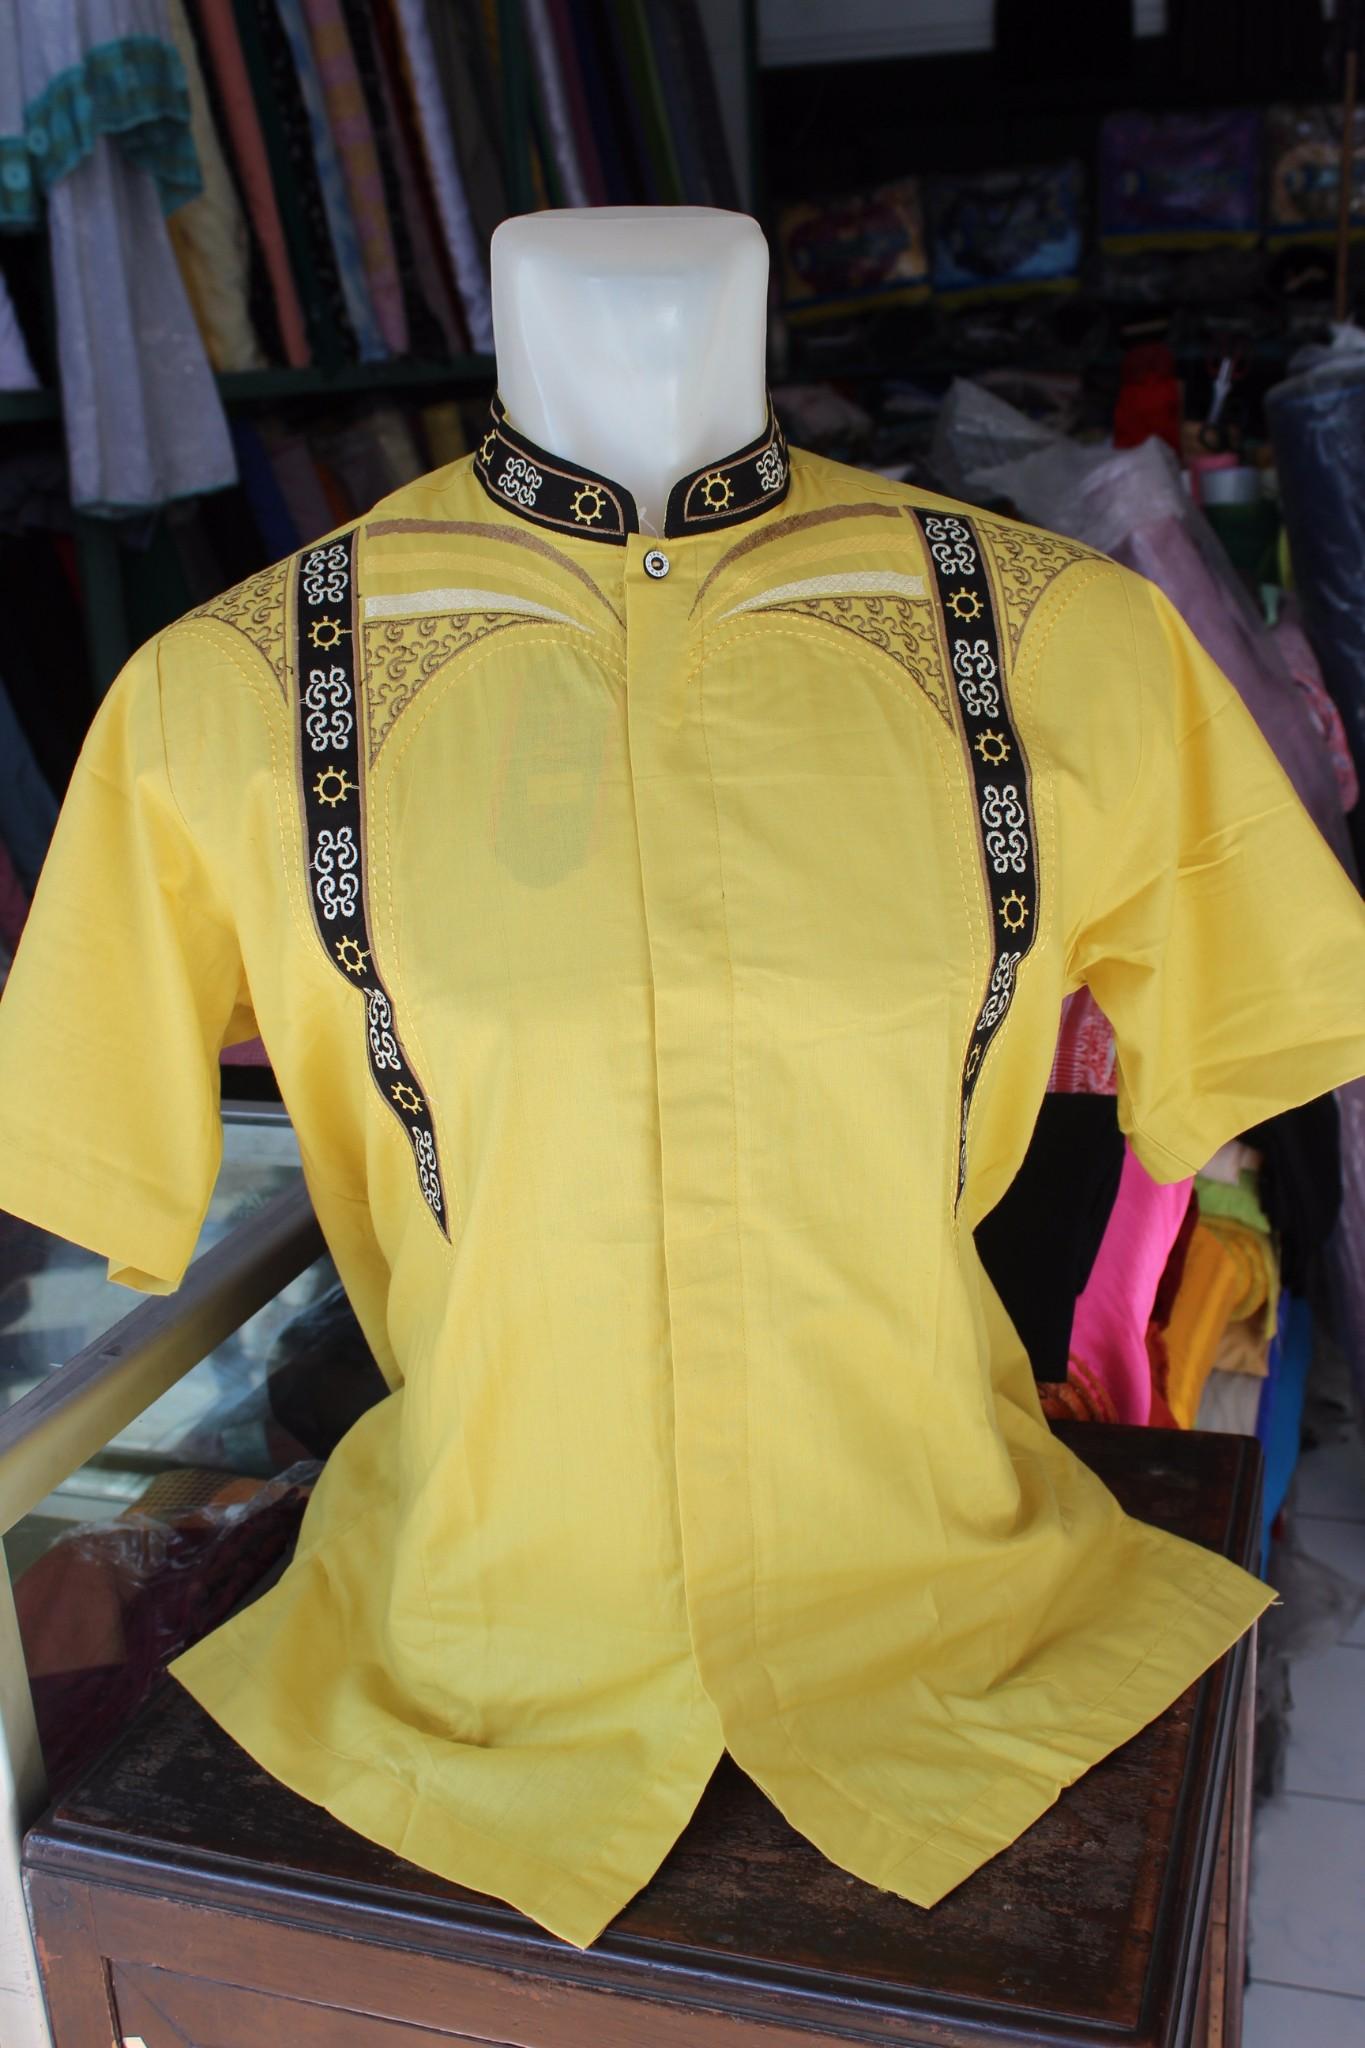 Baju Koko Pria Busana Muslim Oml156 Daftar Harga Terkini Lengan Panjang Kafa Katun Minyak Jual Kode Ad 68 Kuning Esquina Collection